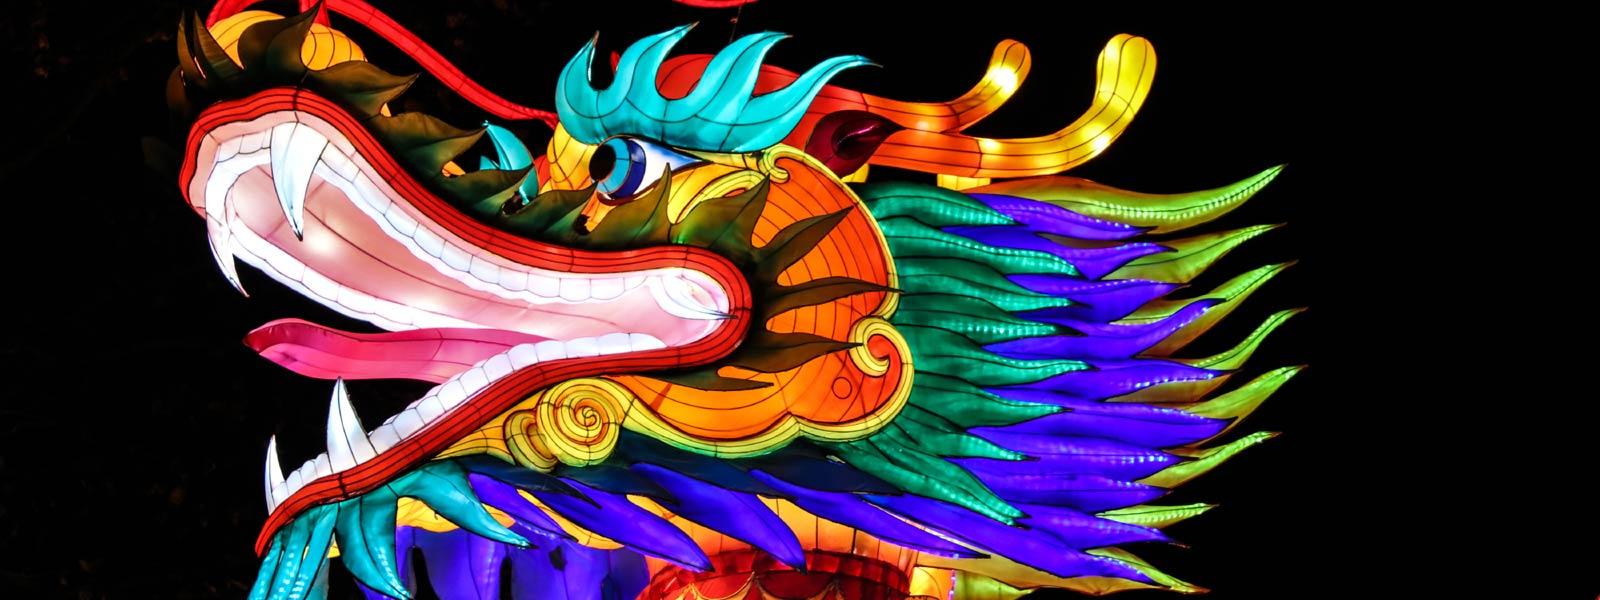 Colourful Chinese dragon lantern